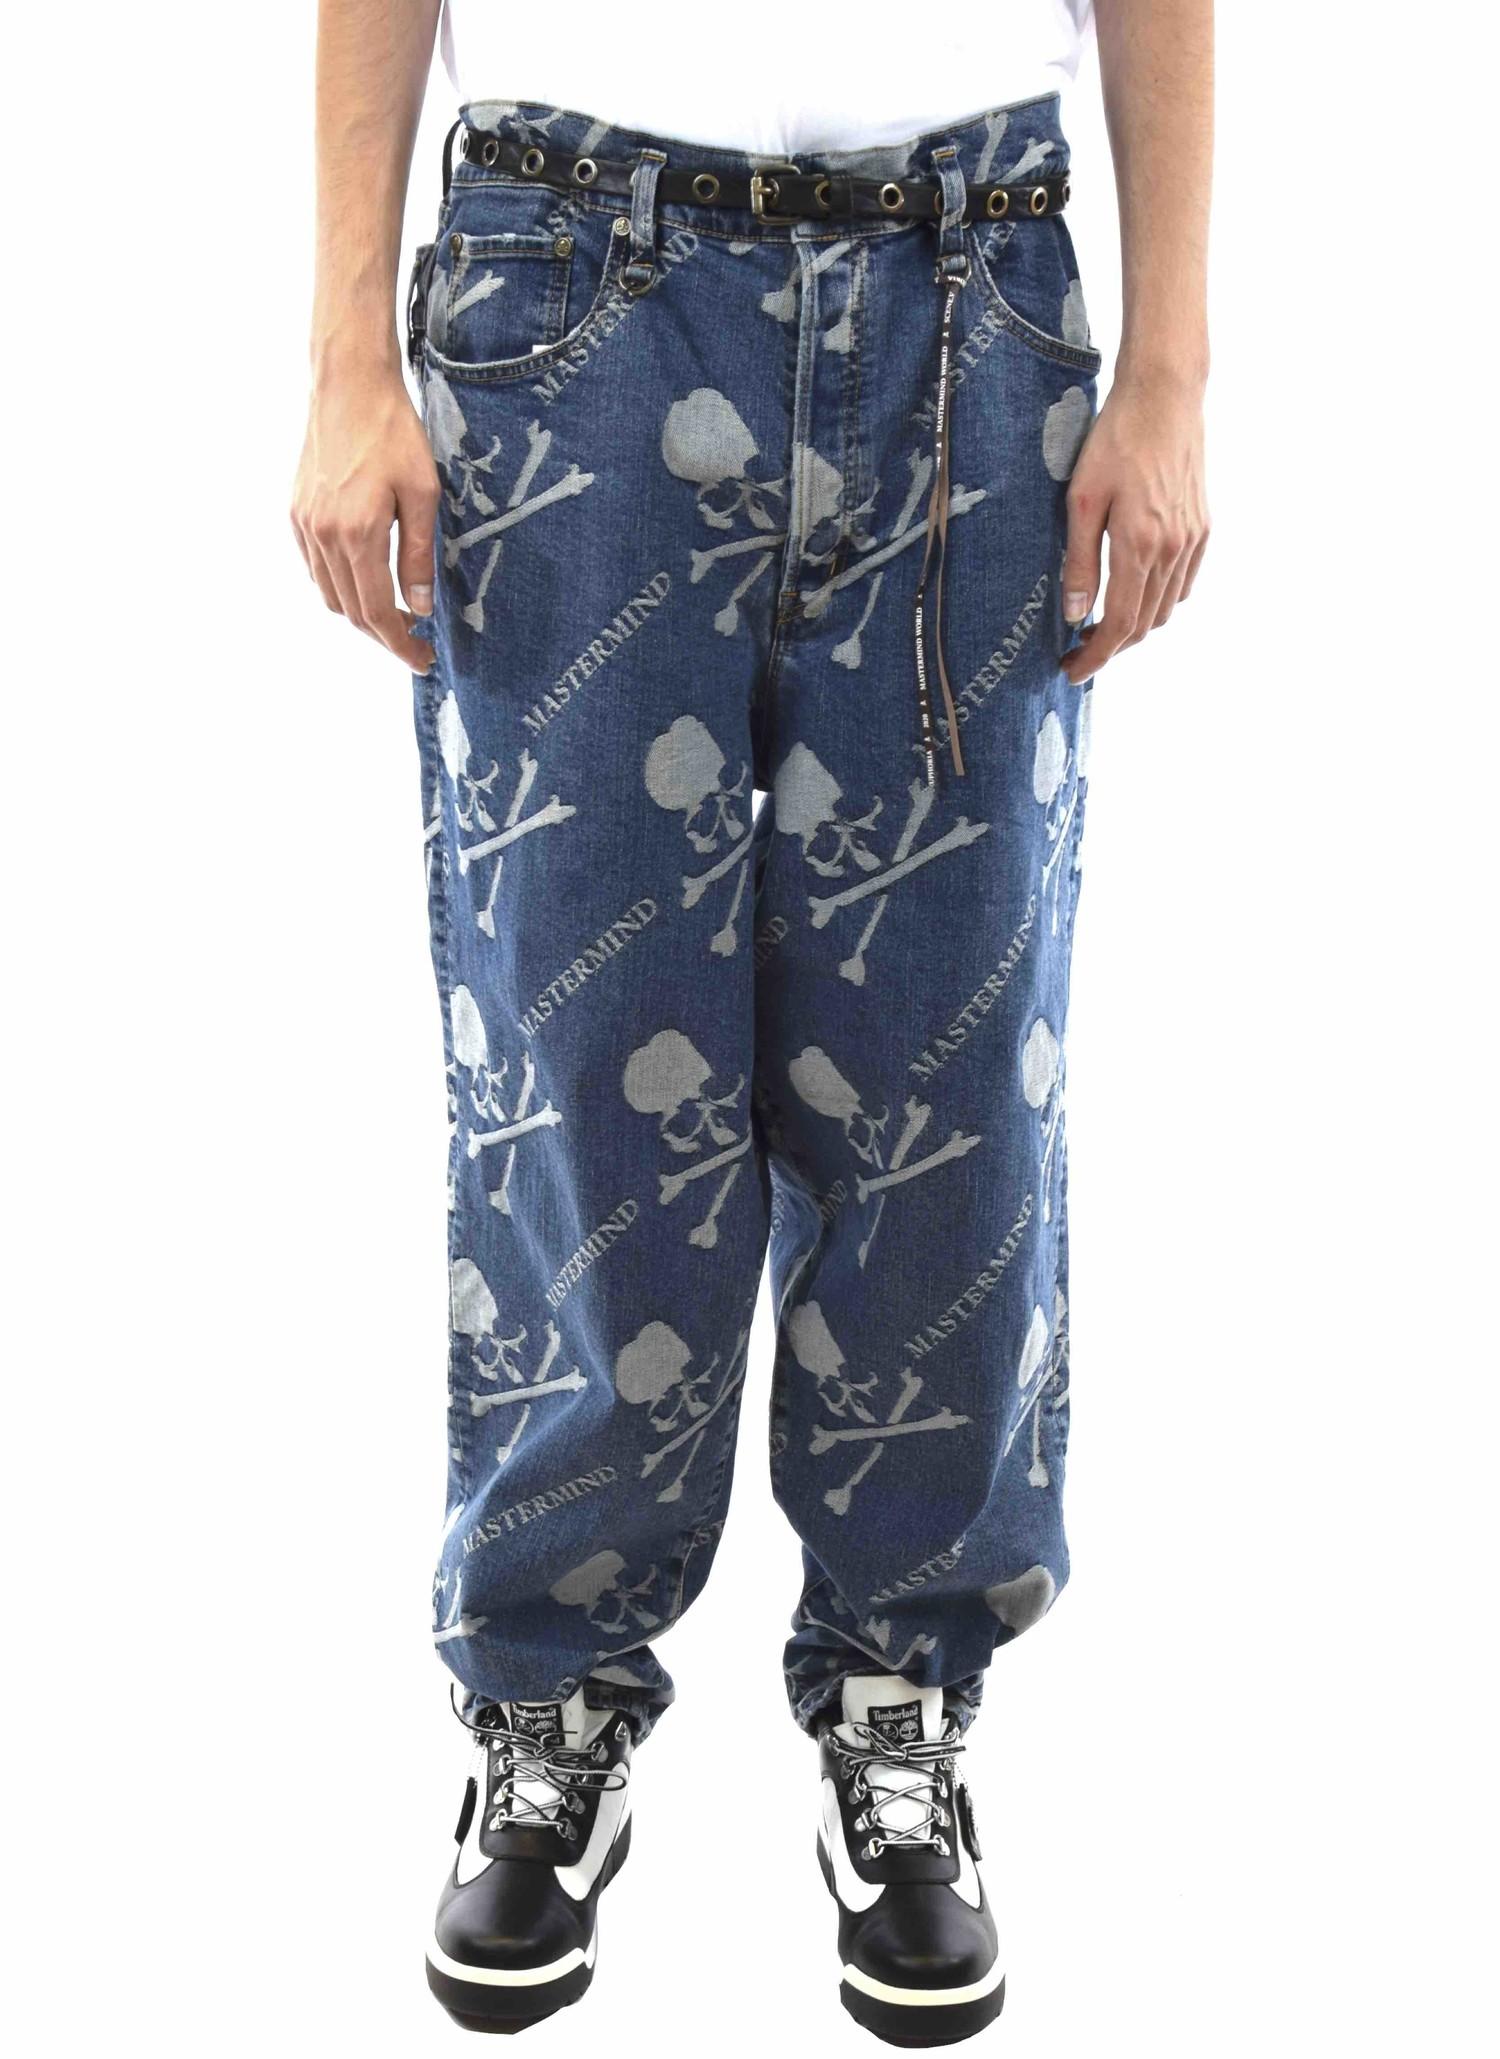 Mastermind World Monogram Denim Jeans Pants Blue Halo Halo